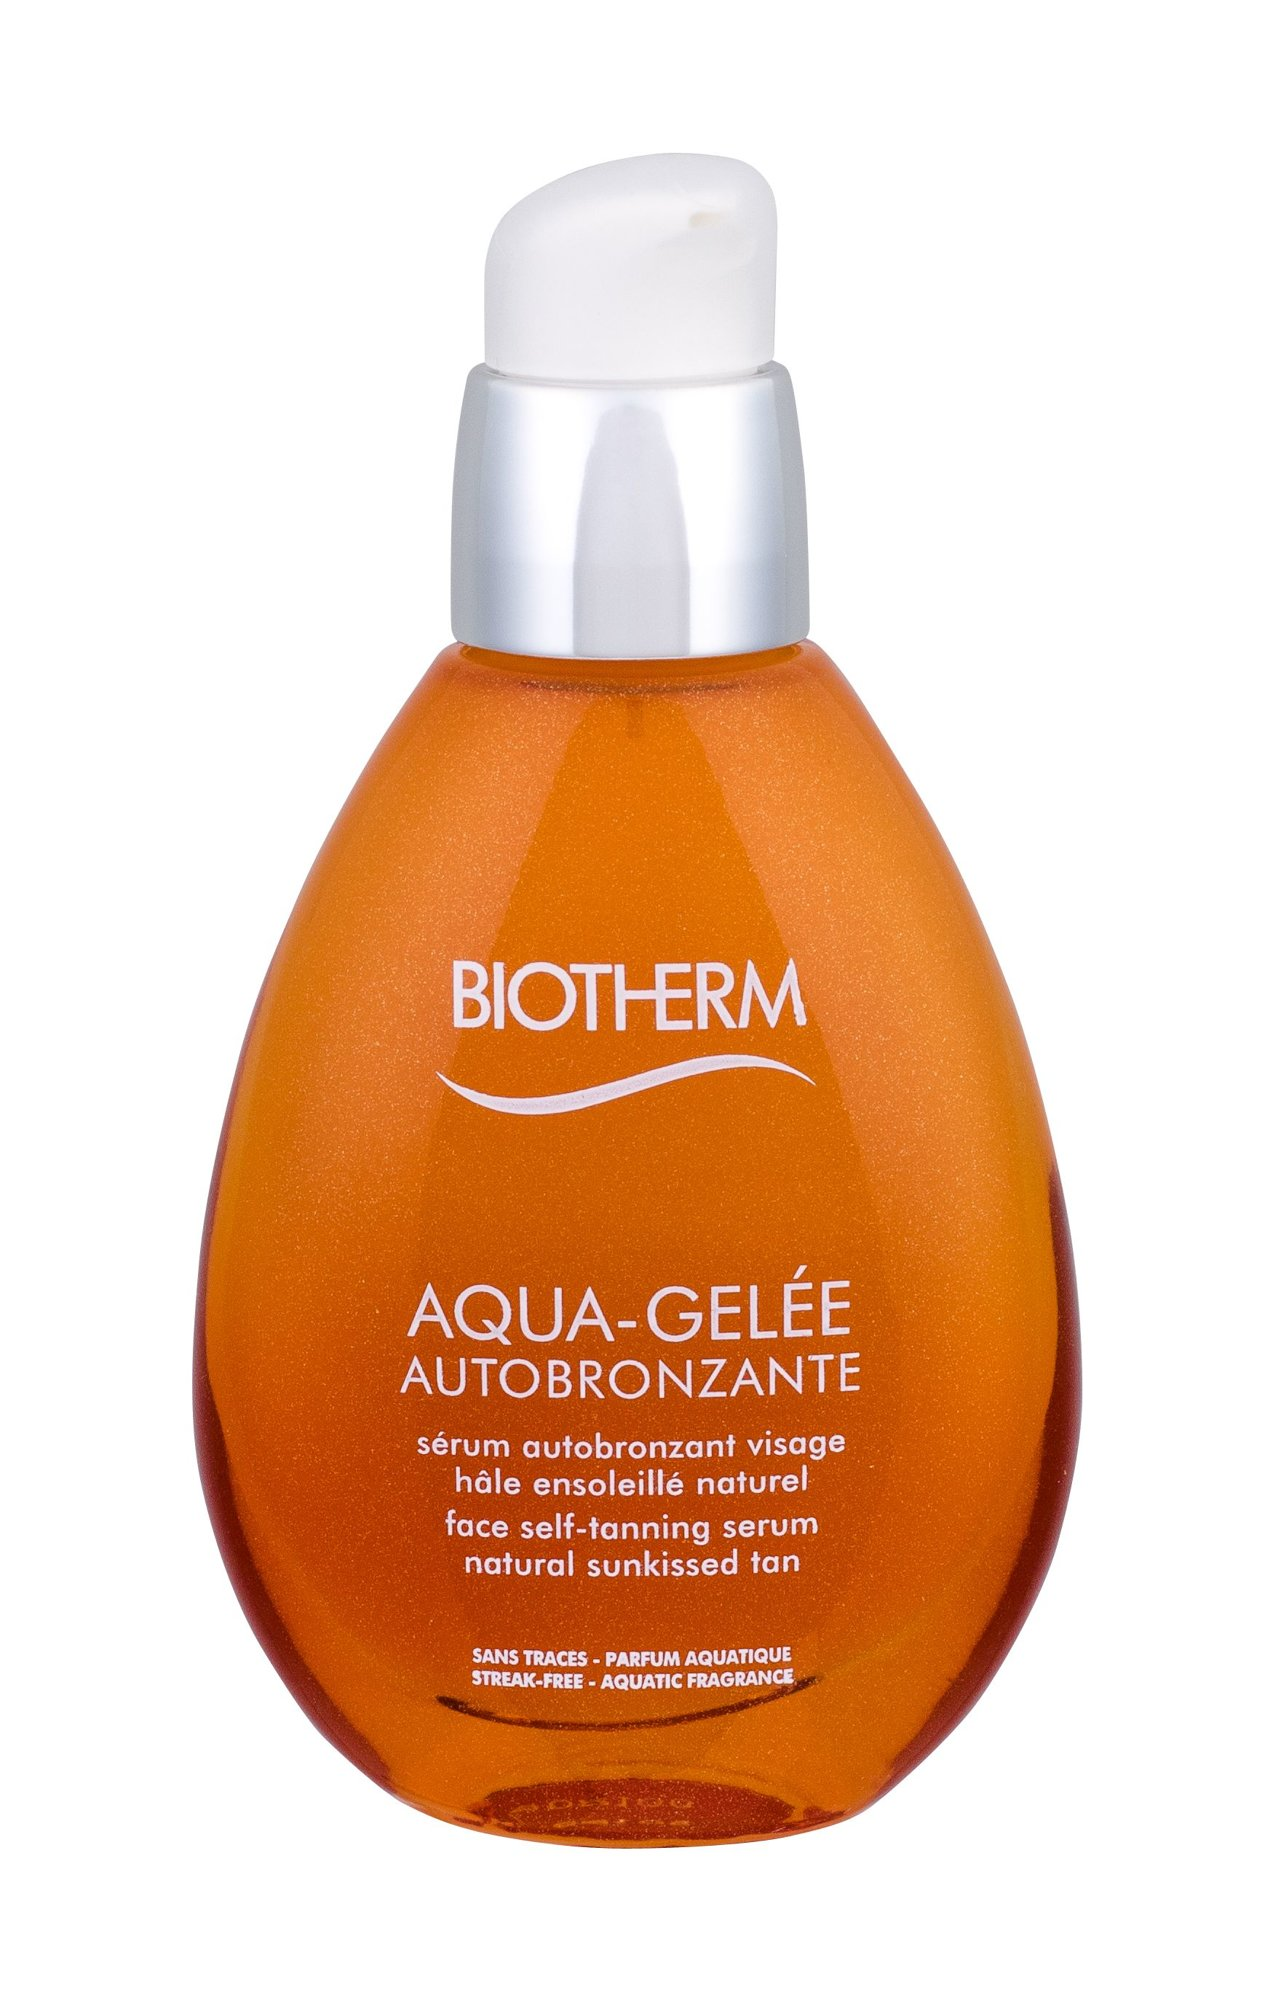 Biotherm Autobronzant Self Tanning Product 50ml